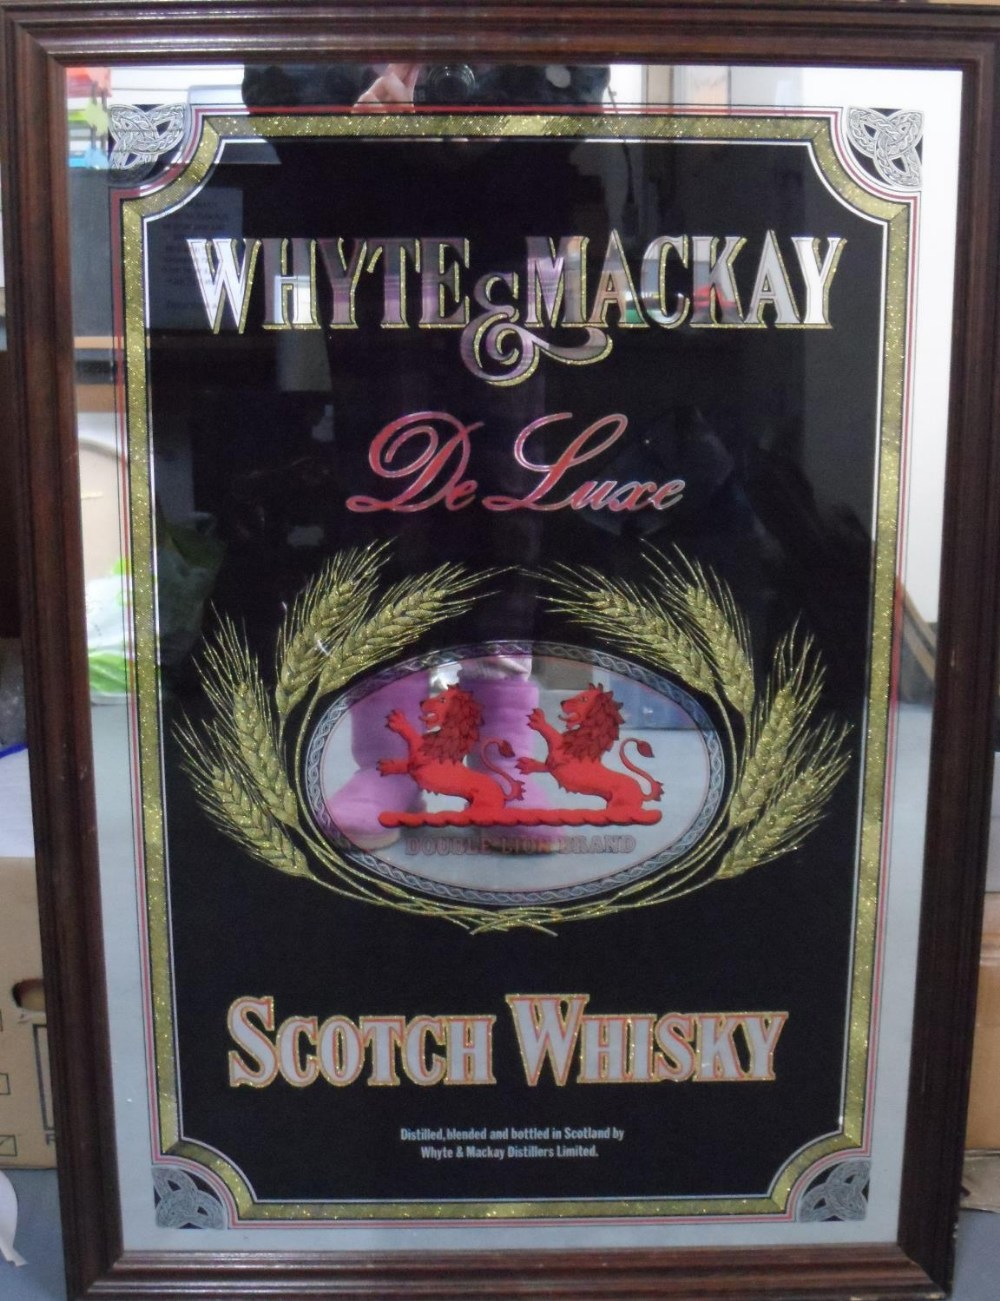 Whyte & MacKay, Scotch whiskey advertising mirror in oak frame, The mirror measures 80 x 52 cm